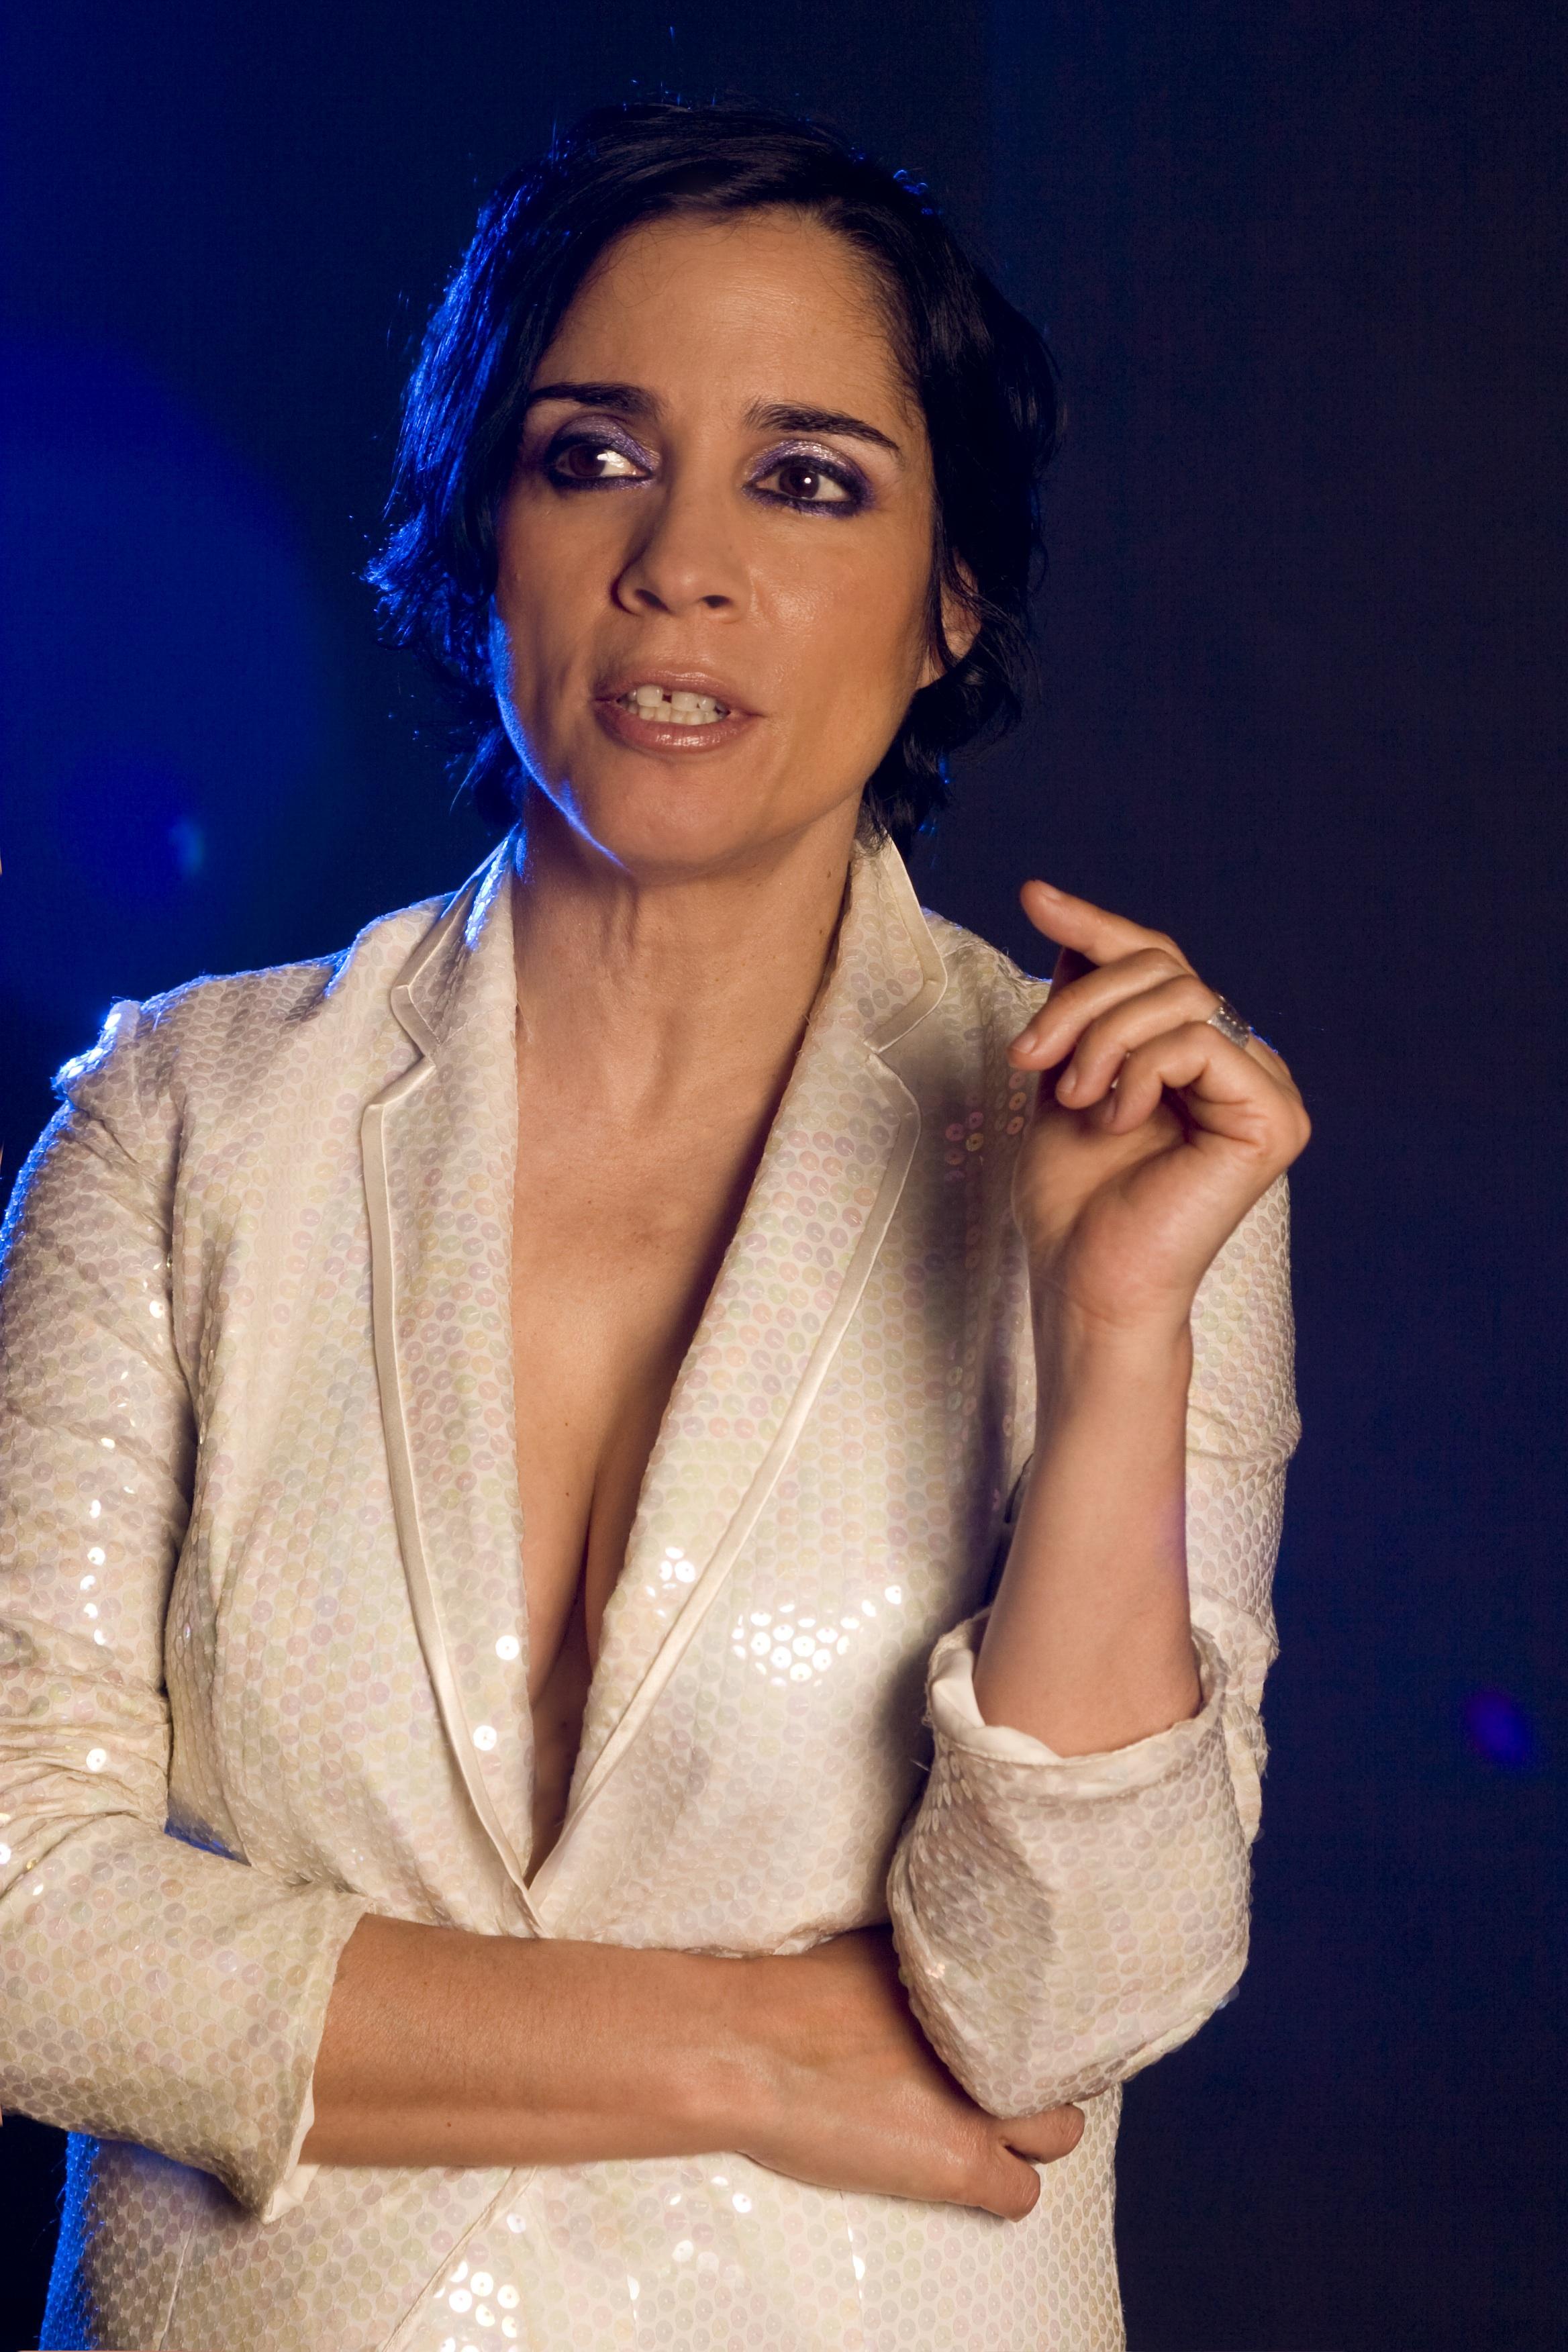 Marga Gomez